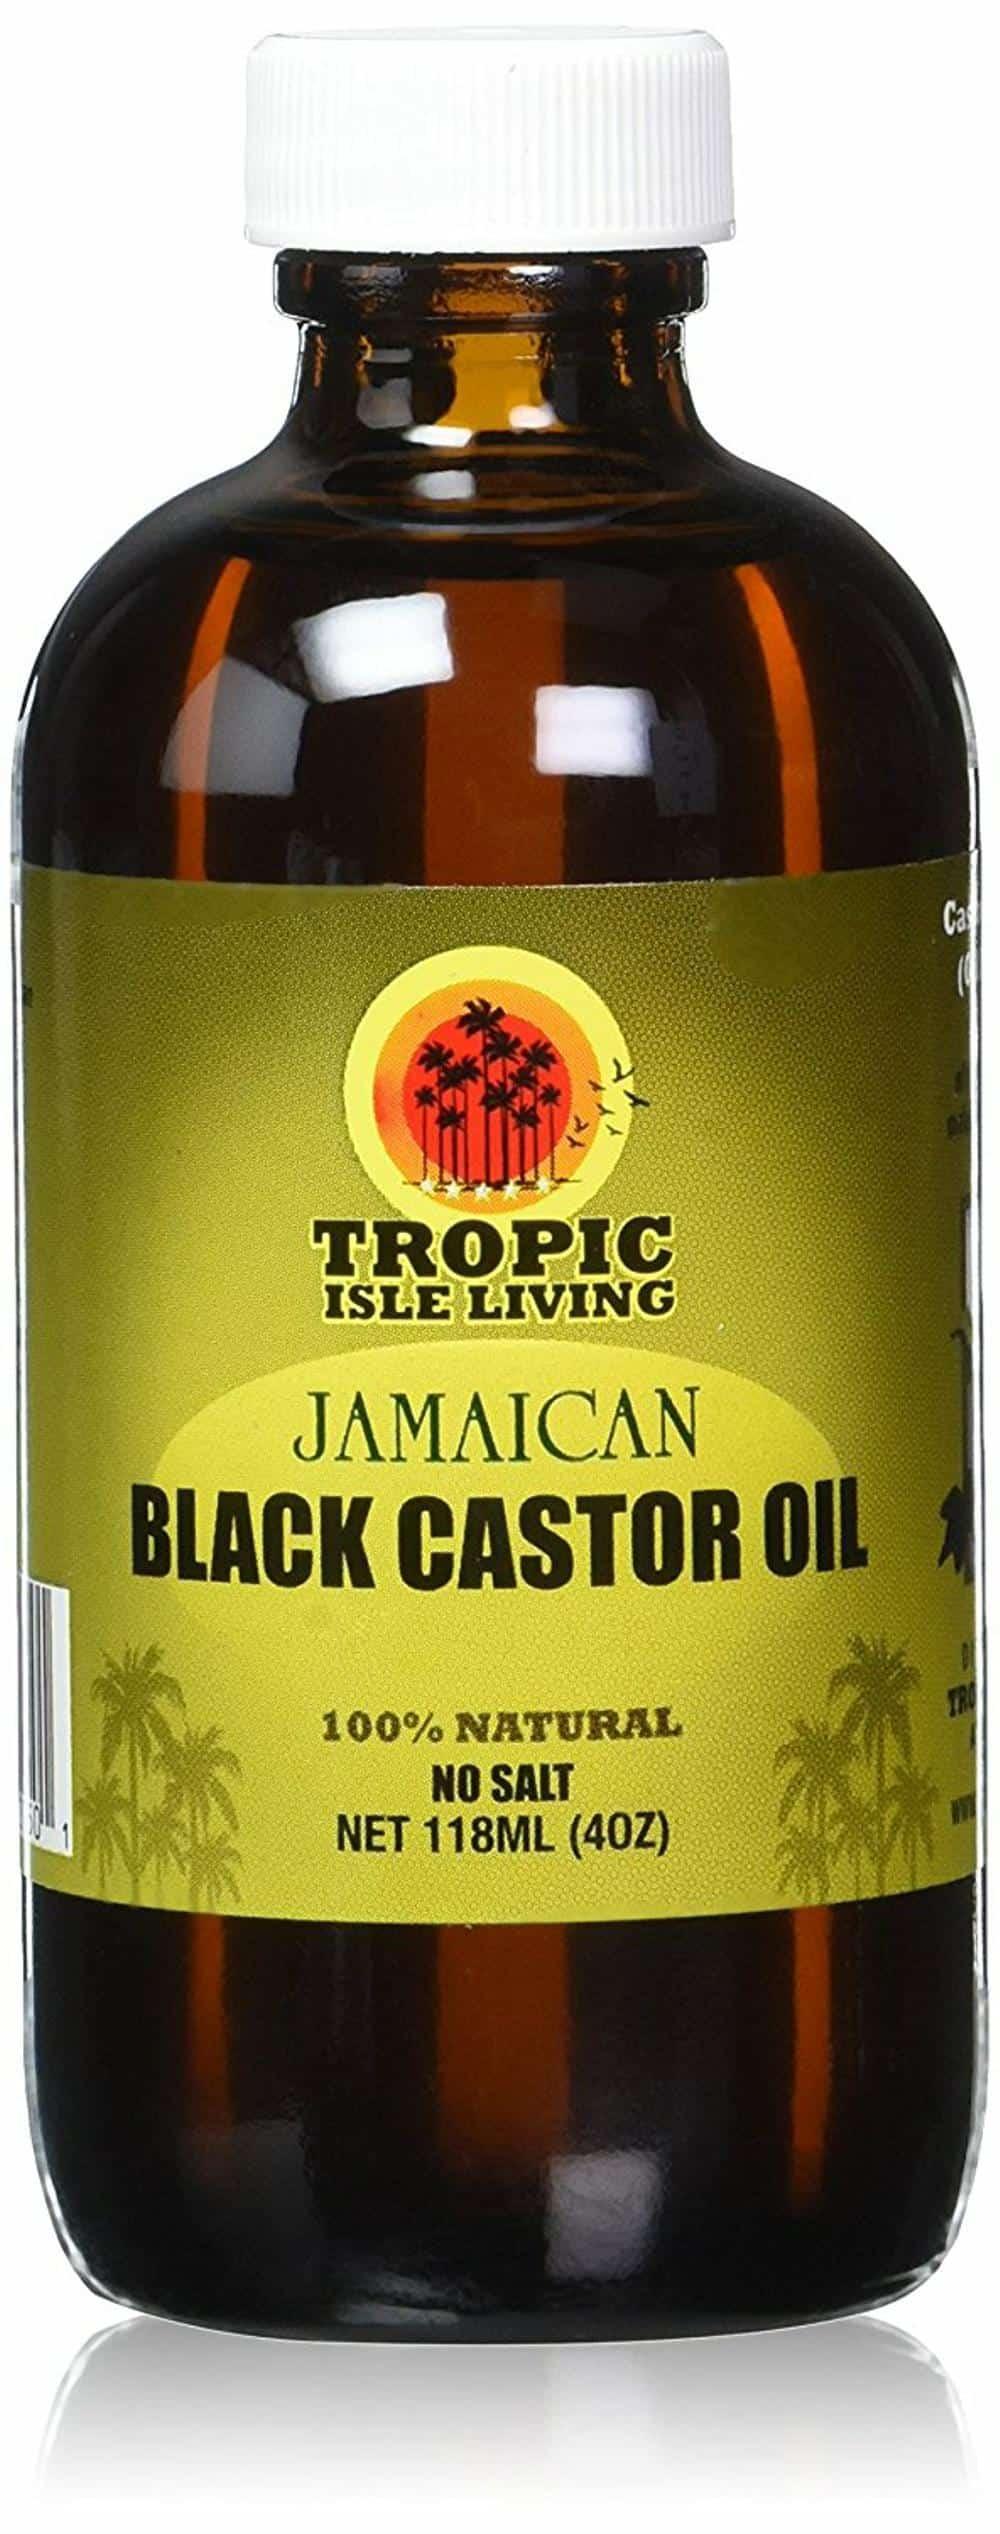 Jamaican Black Castor Oil - The Honest Review [November. 2019]